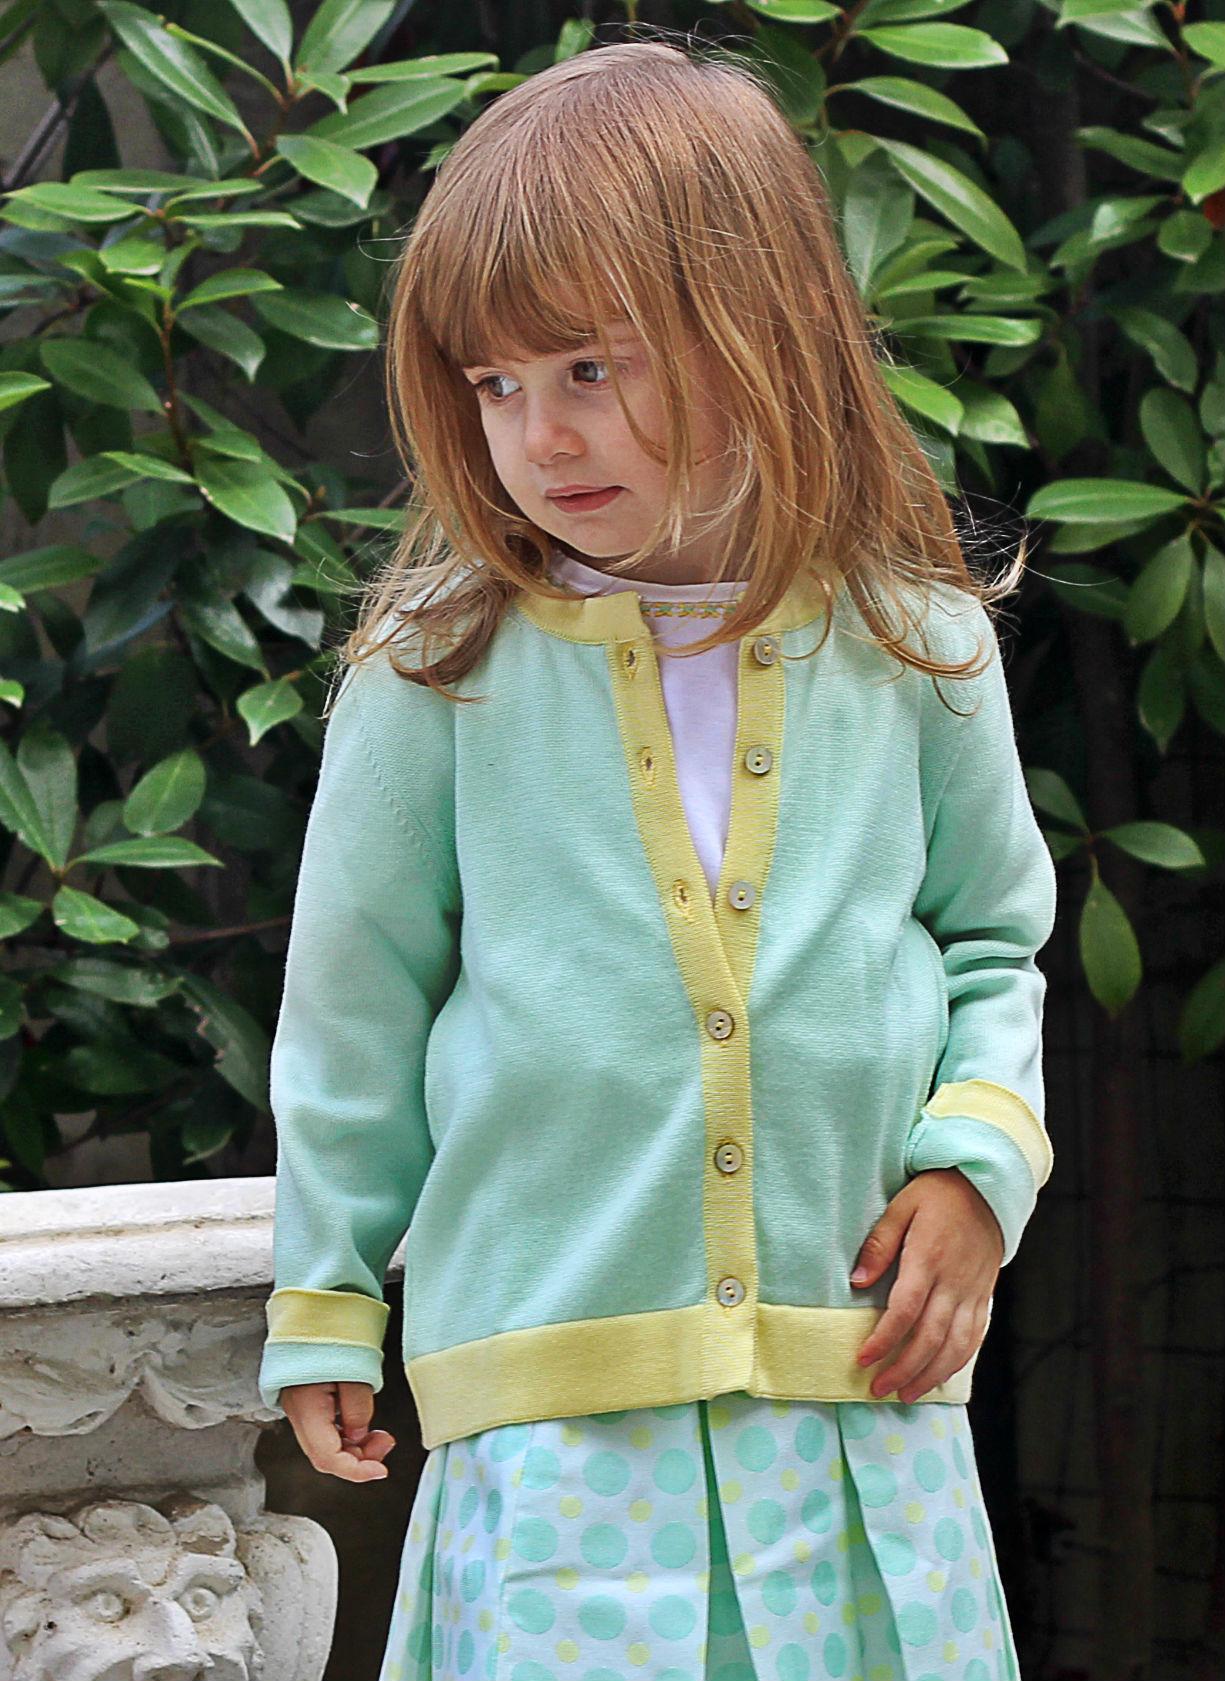 Gaia Masseroni Gusella milano moda bimbi colori pastello